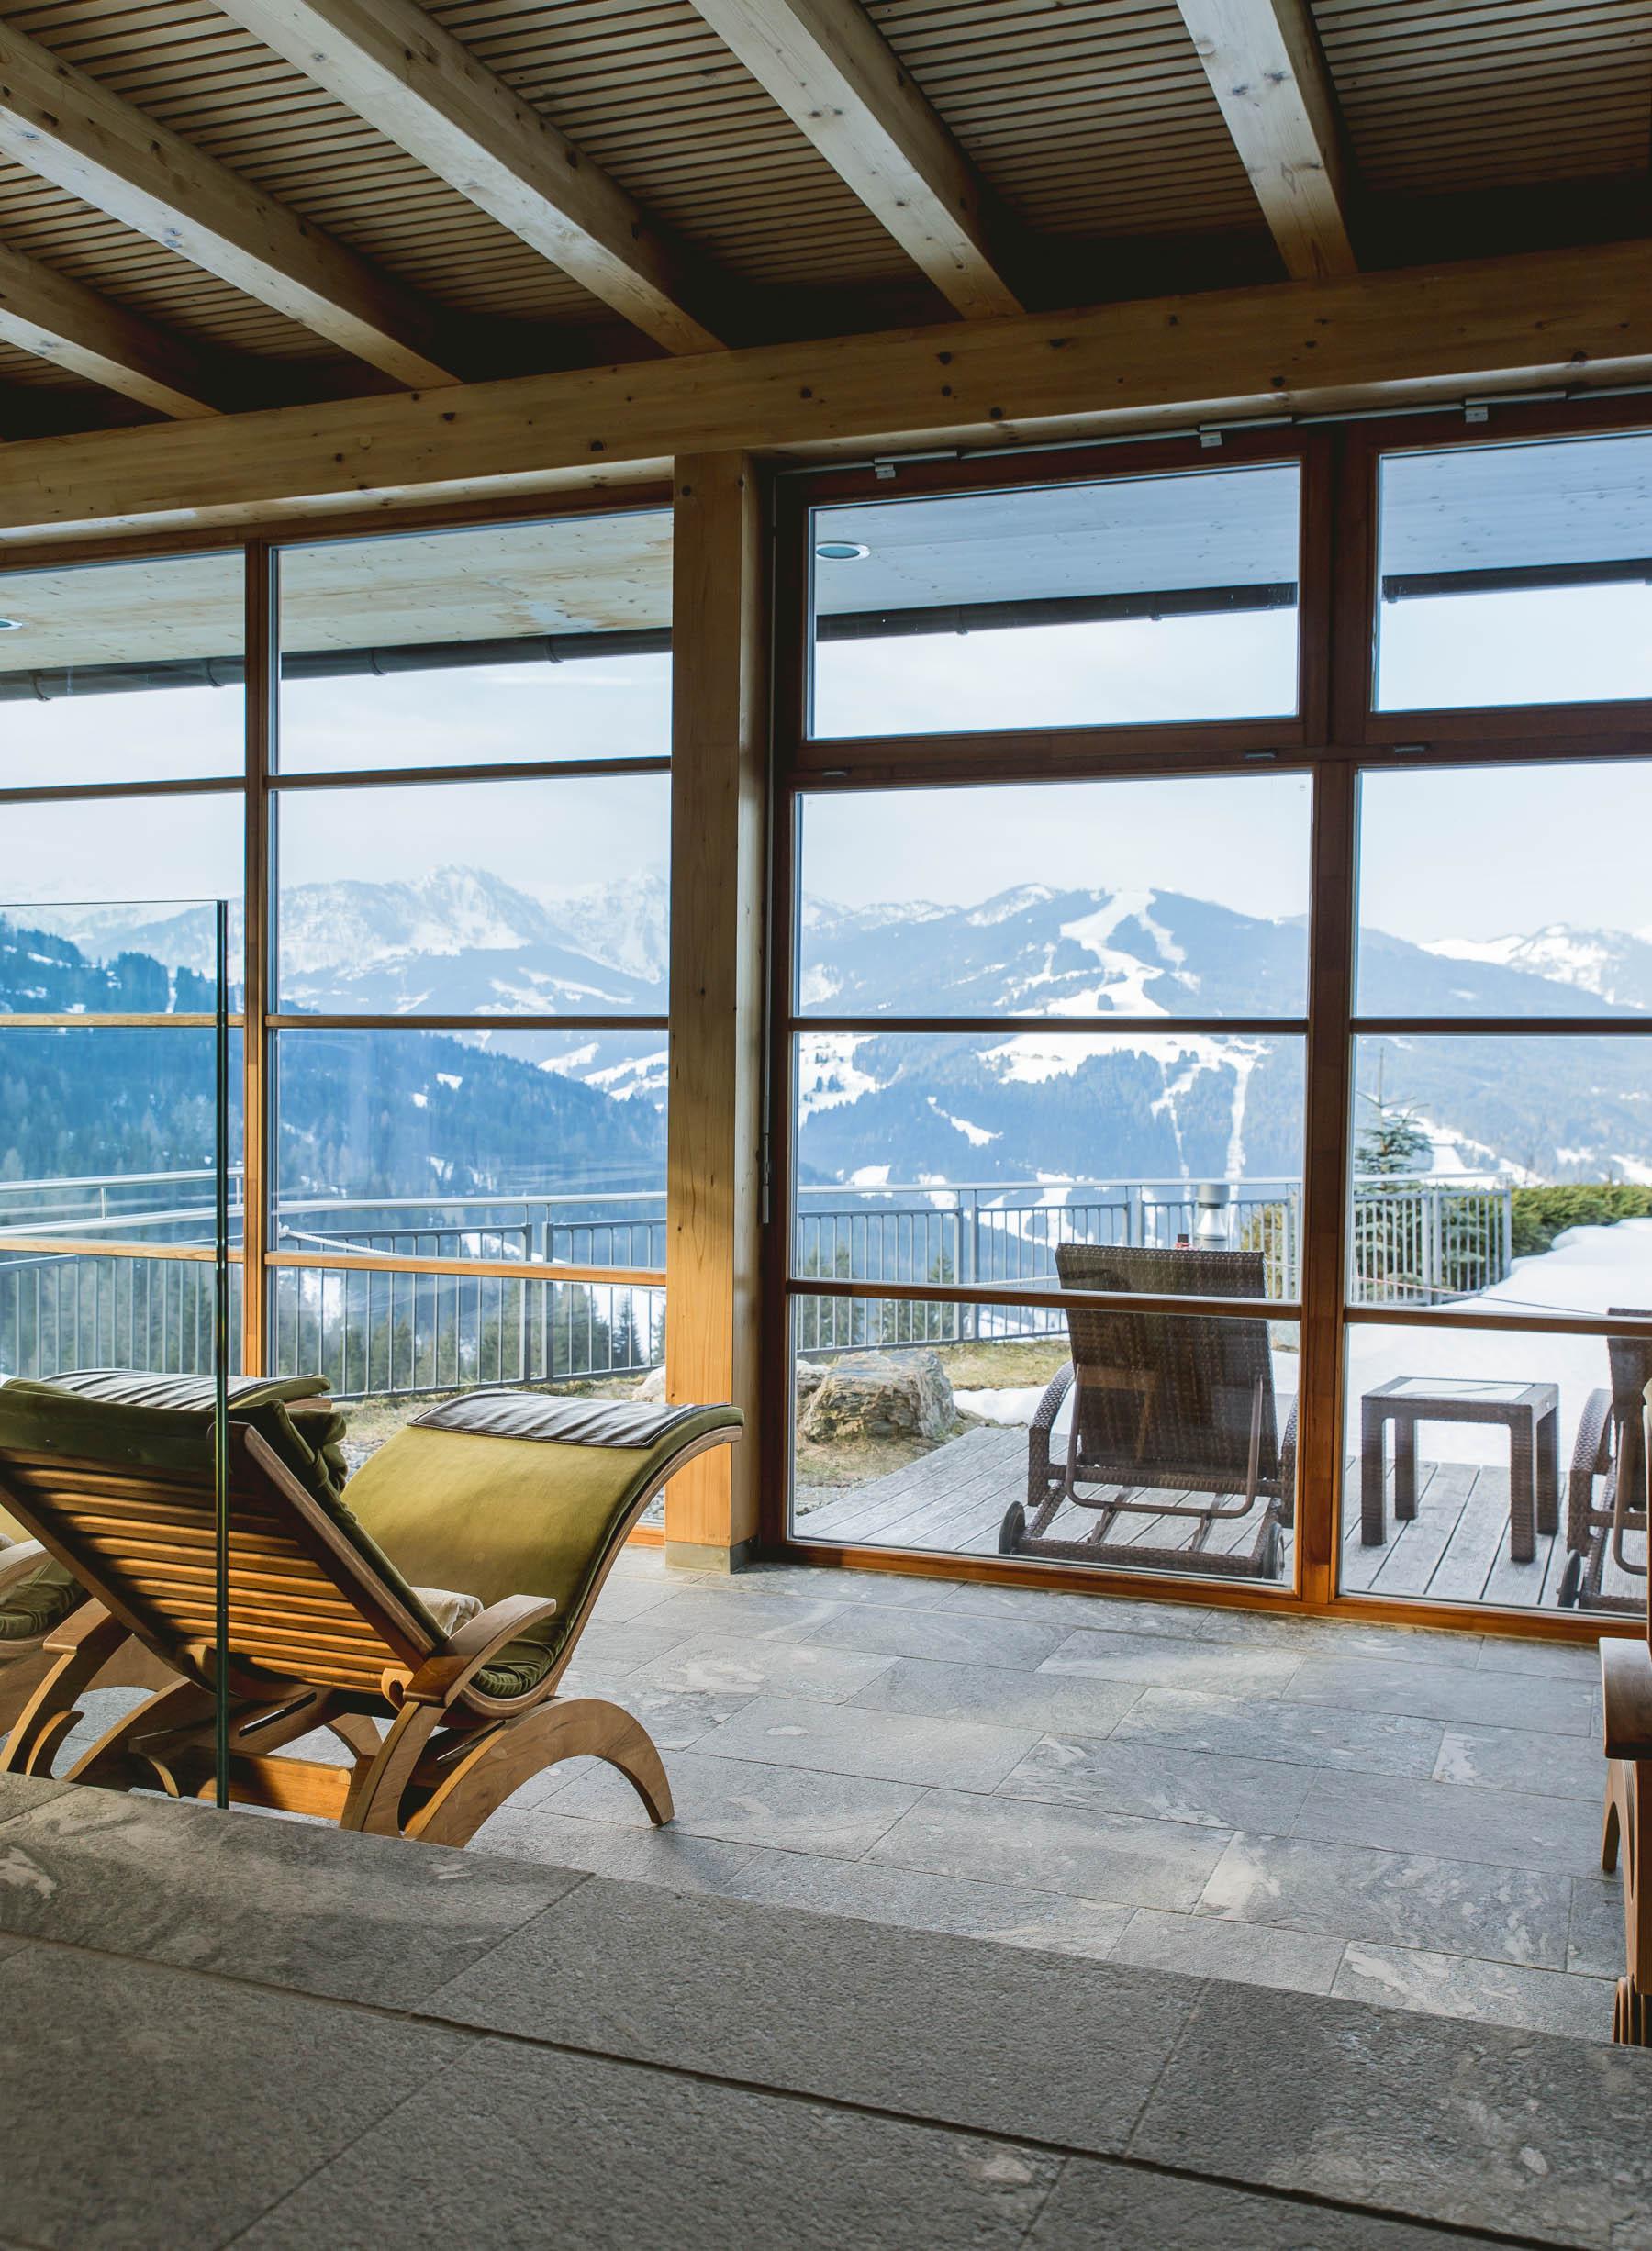 wellnesshotel edelweiss austria, skiferie i Wagrain